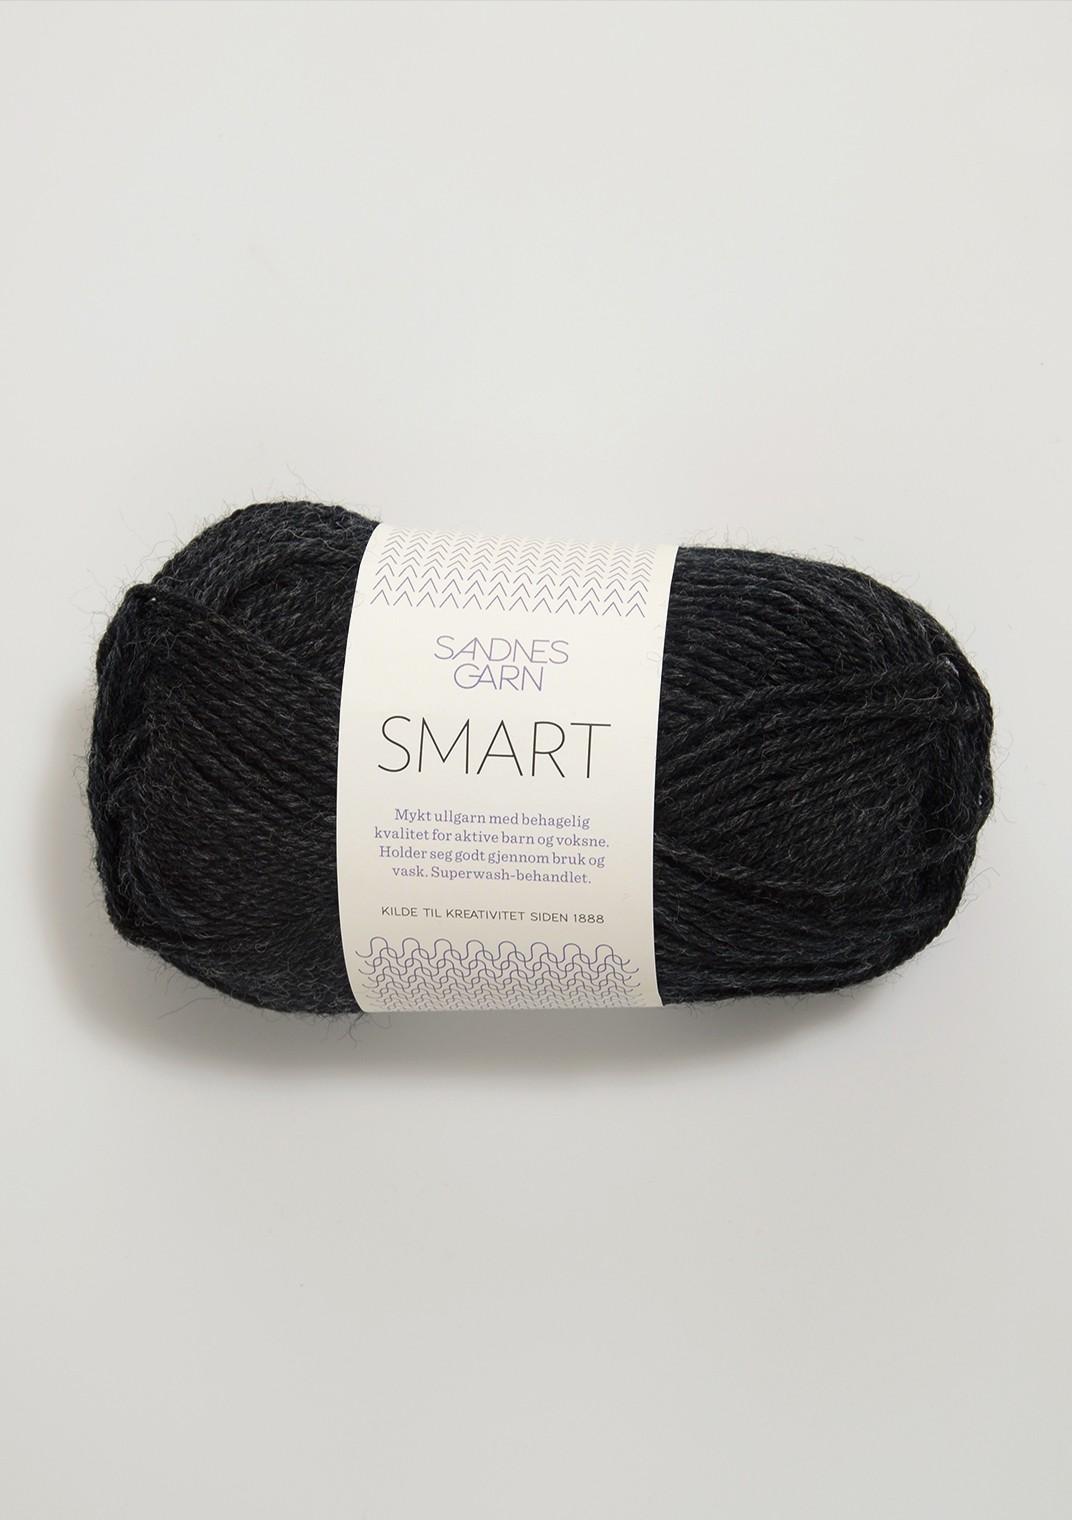 Sandnes smart 1088